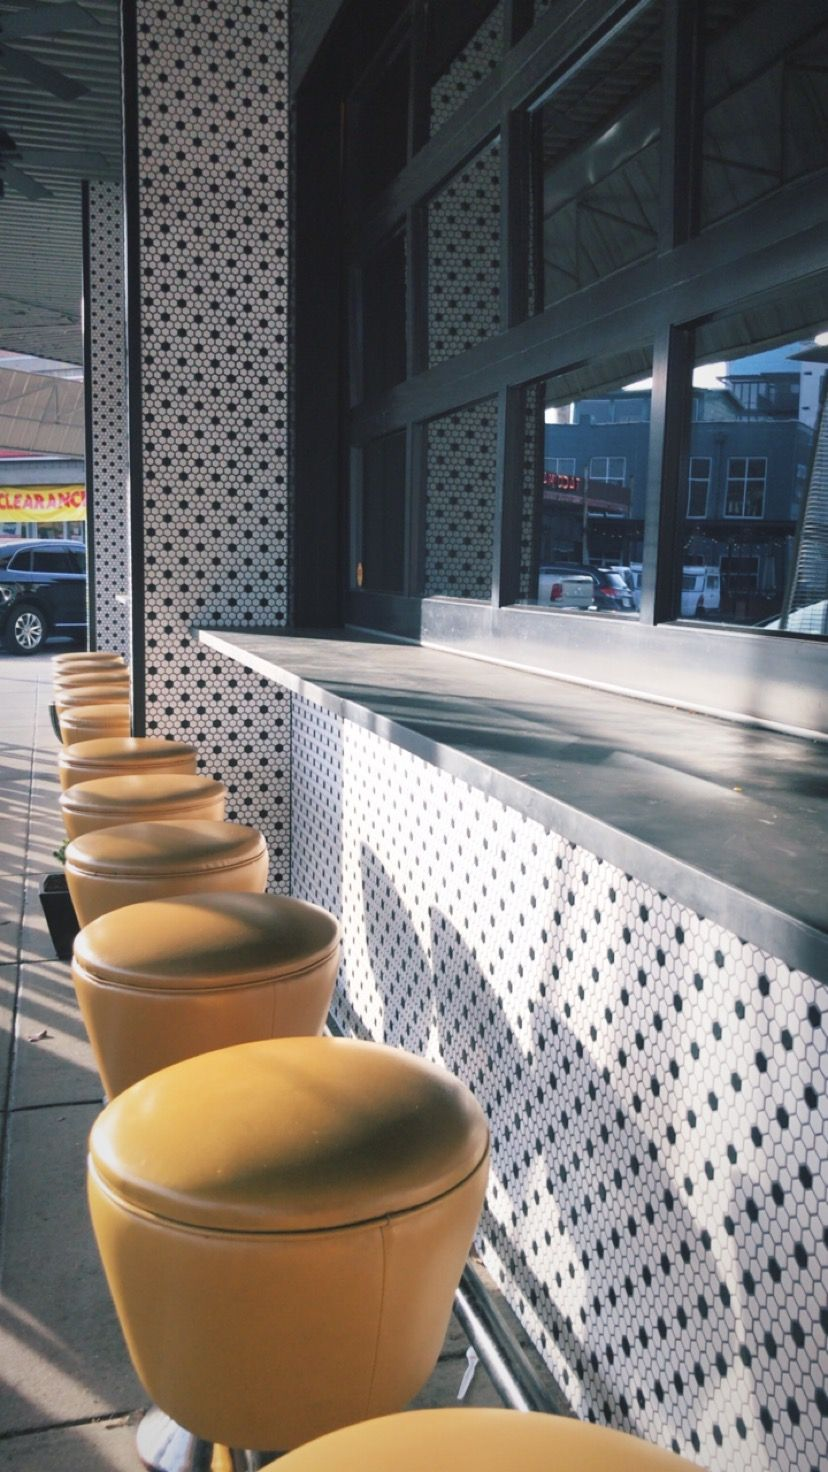 Park Art|My WordPress Blog_Food City Bakery Dalton Ga